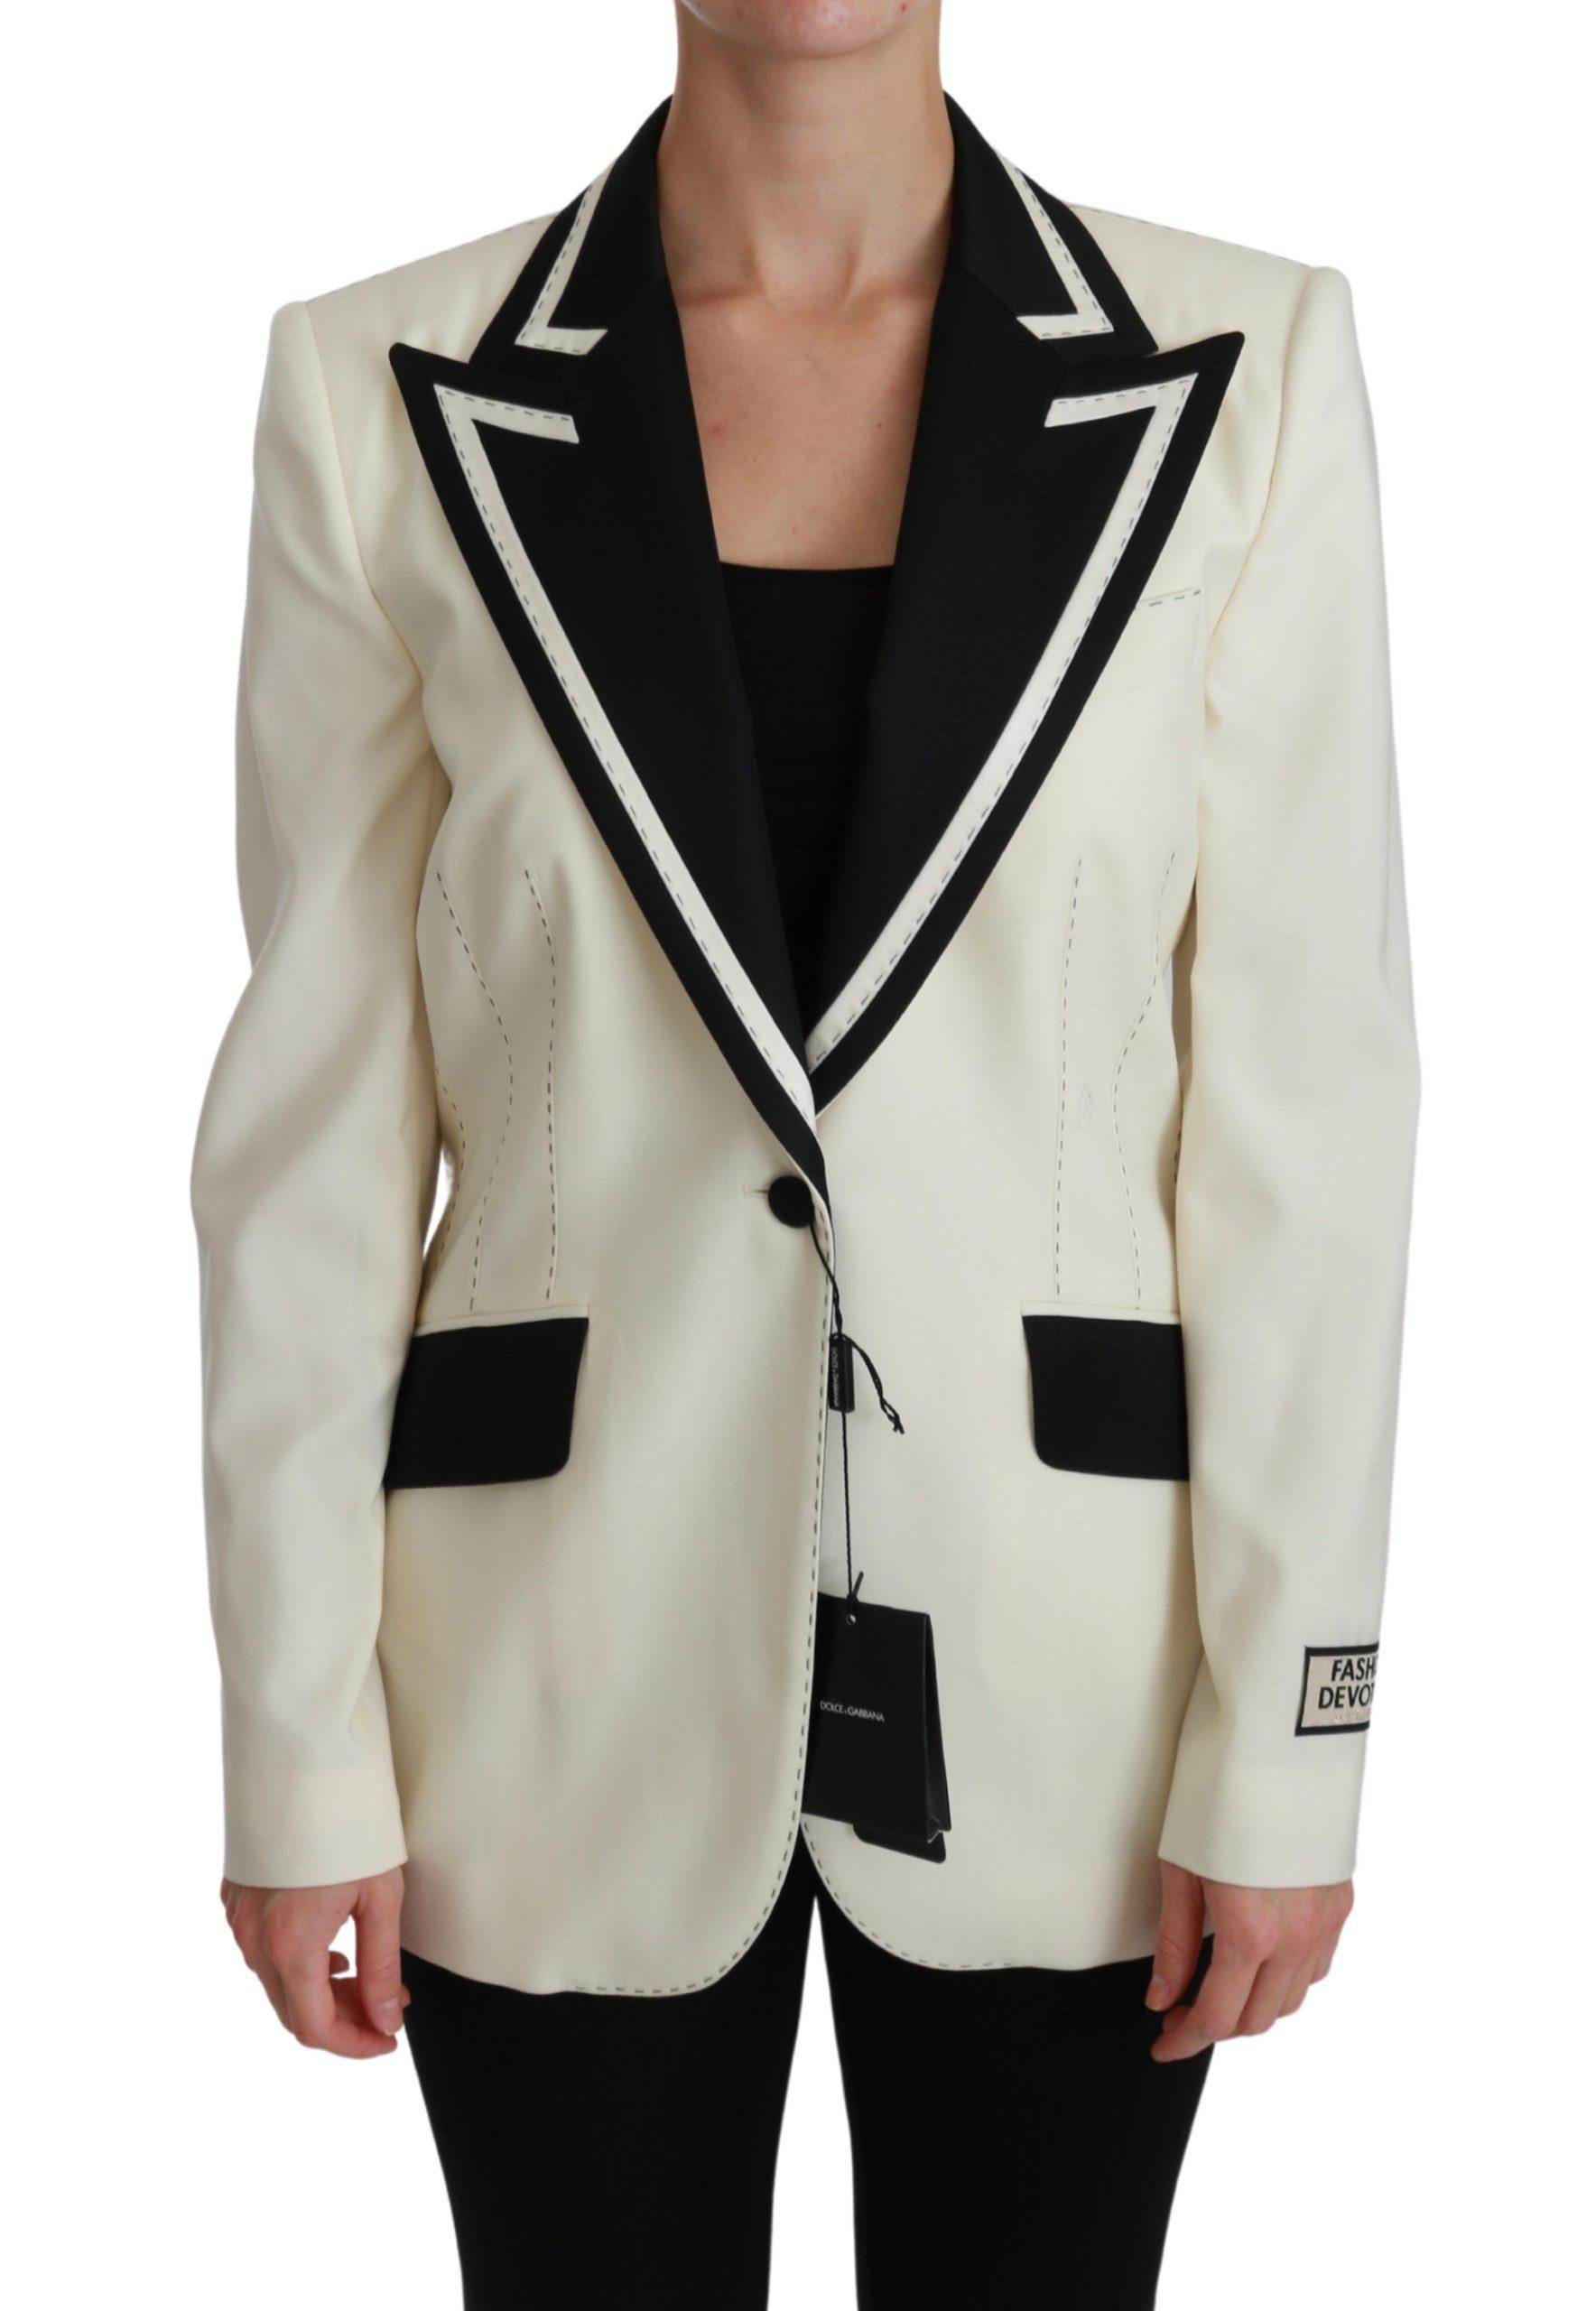 Dolce & Gabbana Women's Cream Single Breasted Blazer Jacket Cream JKT2538 - IT44|L